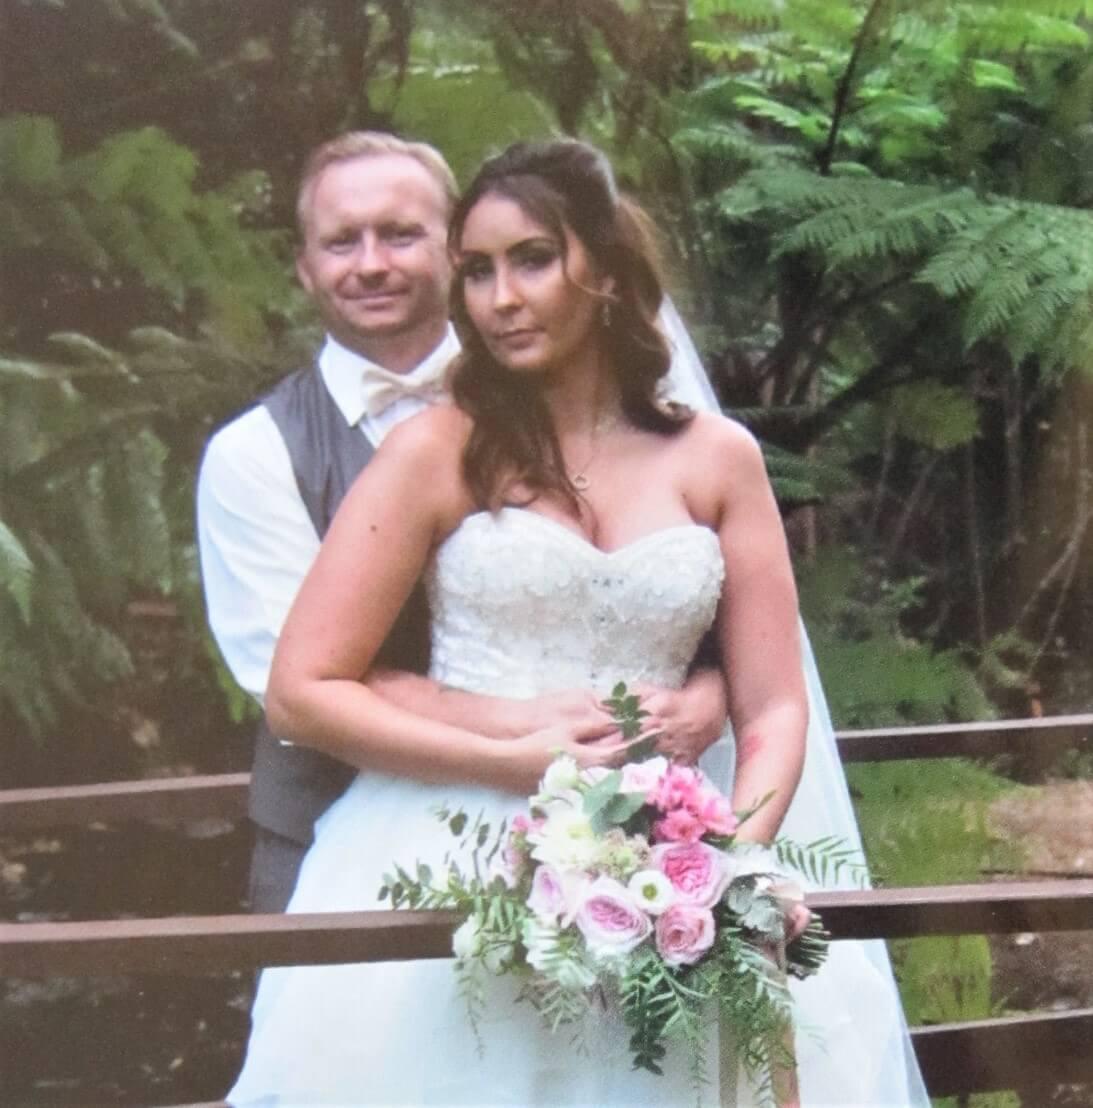 https://www.lovebirdceremonies.com.au/wp-content/uploads/2020/07/Megan-Brett-1.jpg